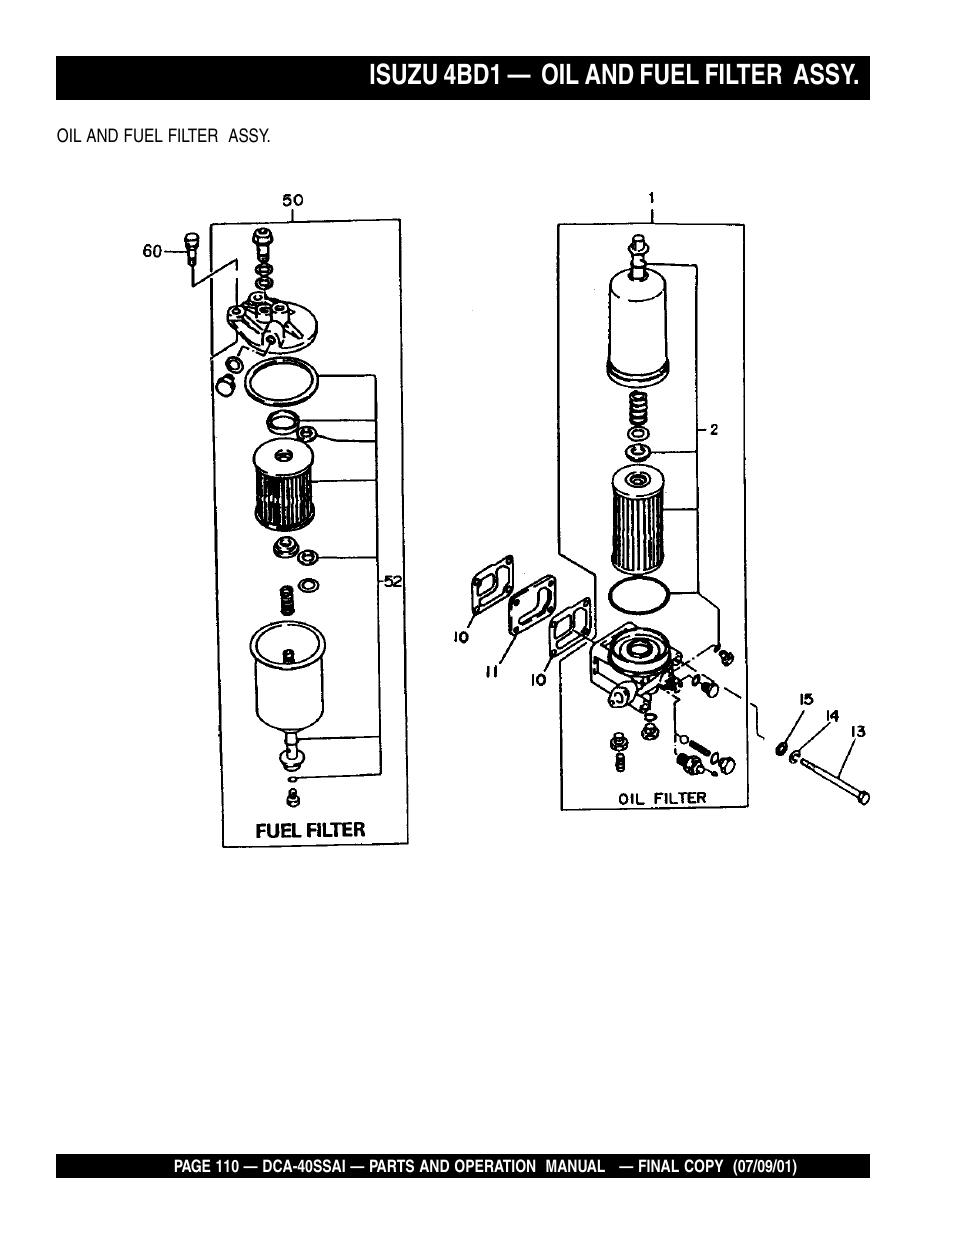 medium resolution of isuzu 4bd1 oil and fuel filter assy multiquip mq power whisperwatttm generator dca 40ssai user manual page 110 140